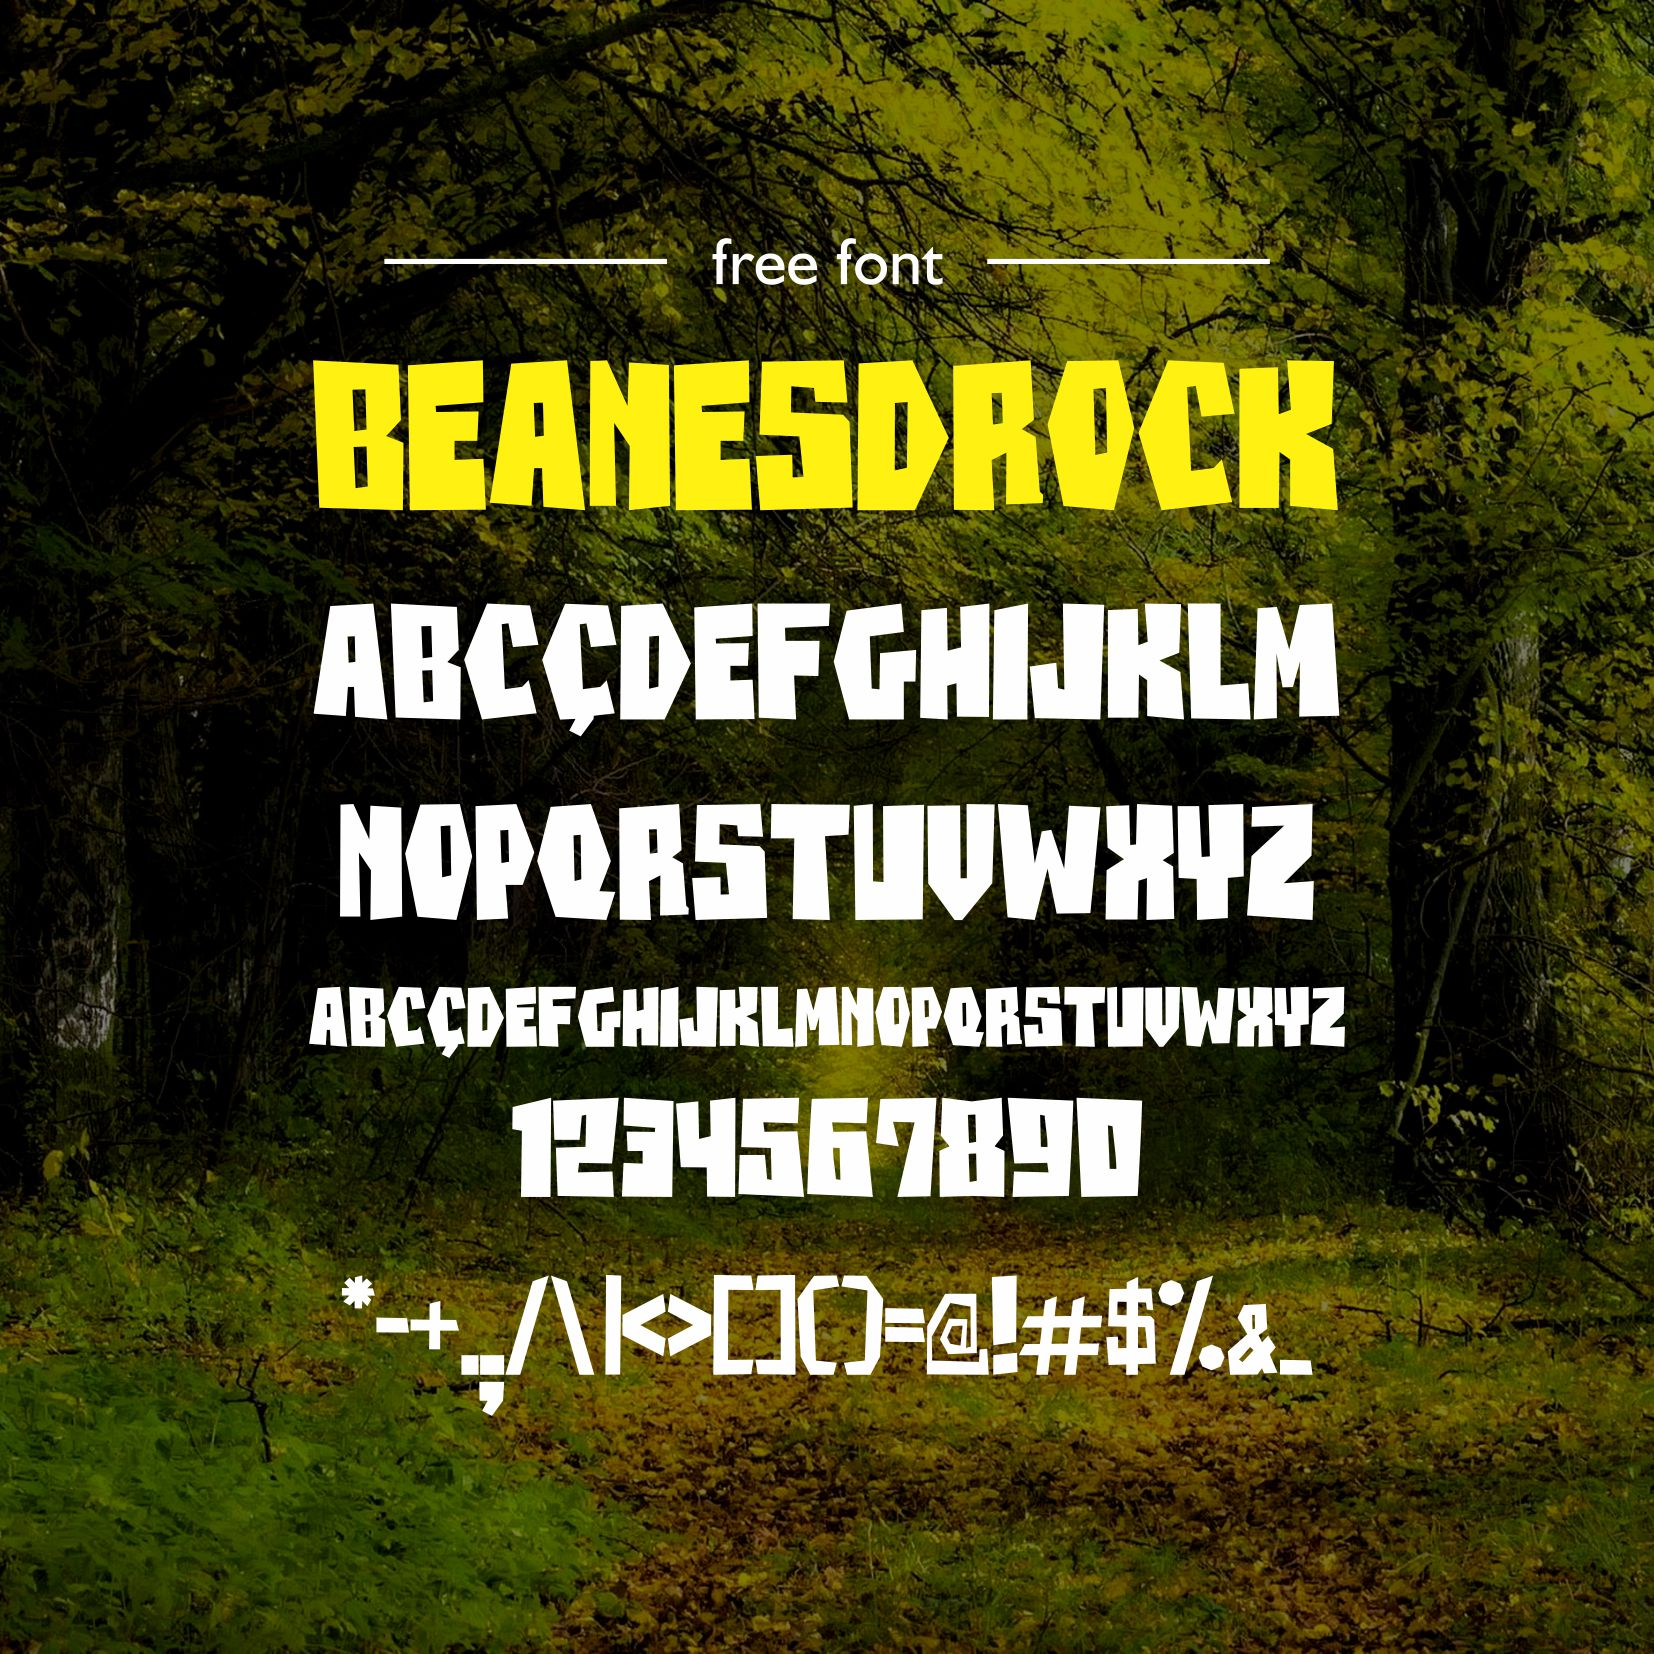 Fonte Beanesdrock